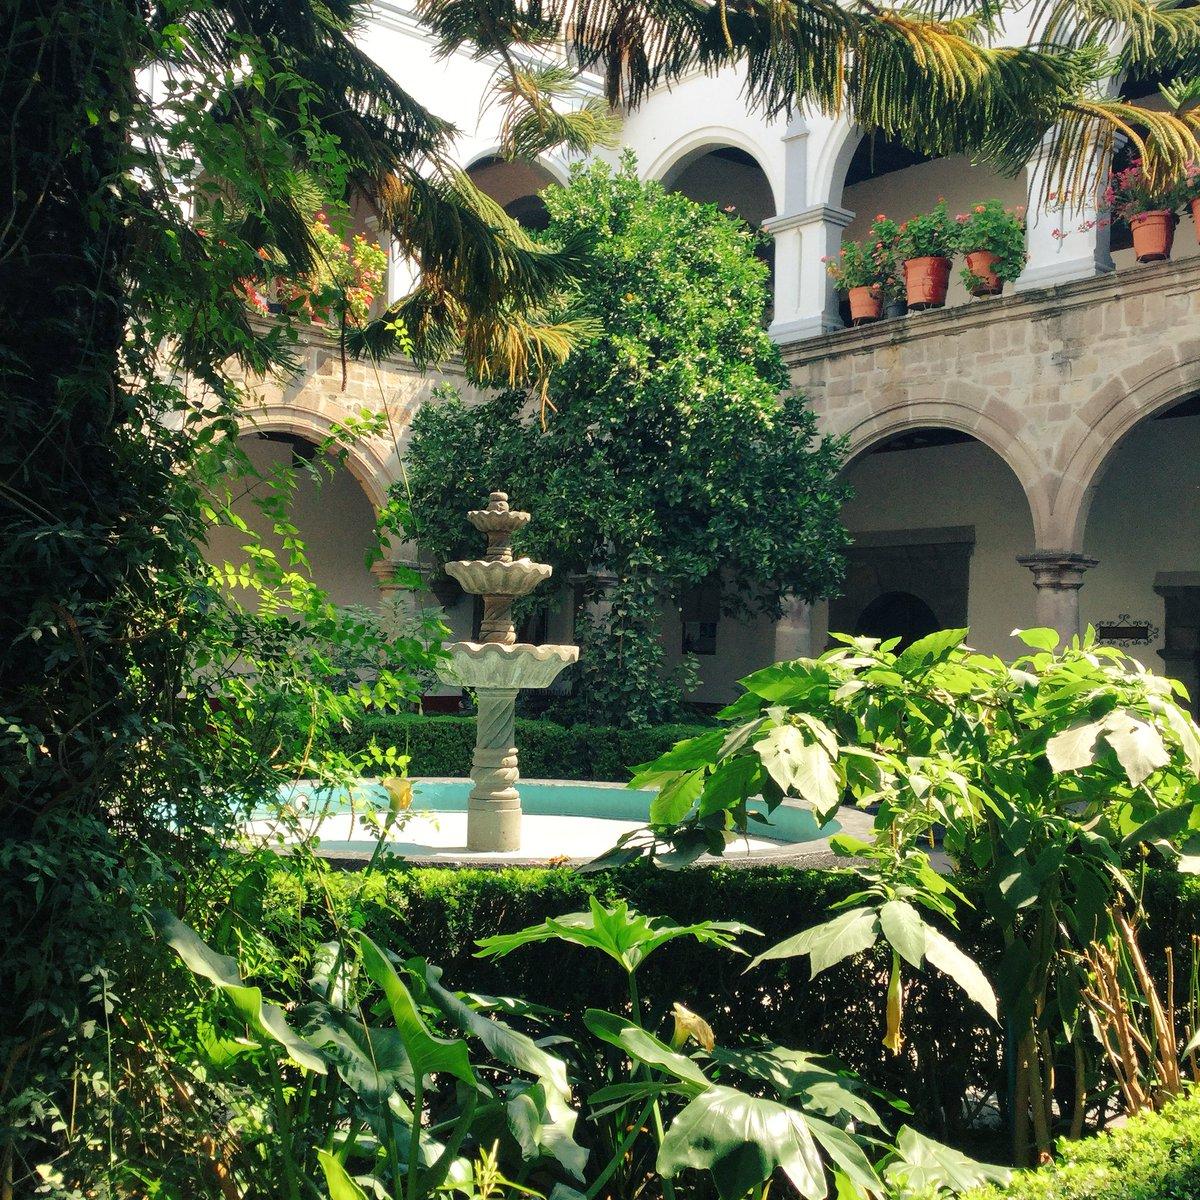 4 pic. I love you México City 💚💚💚 NjYOAbV8bs